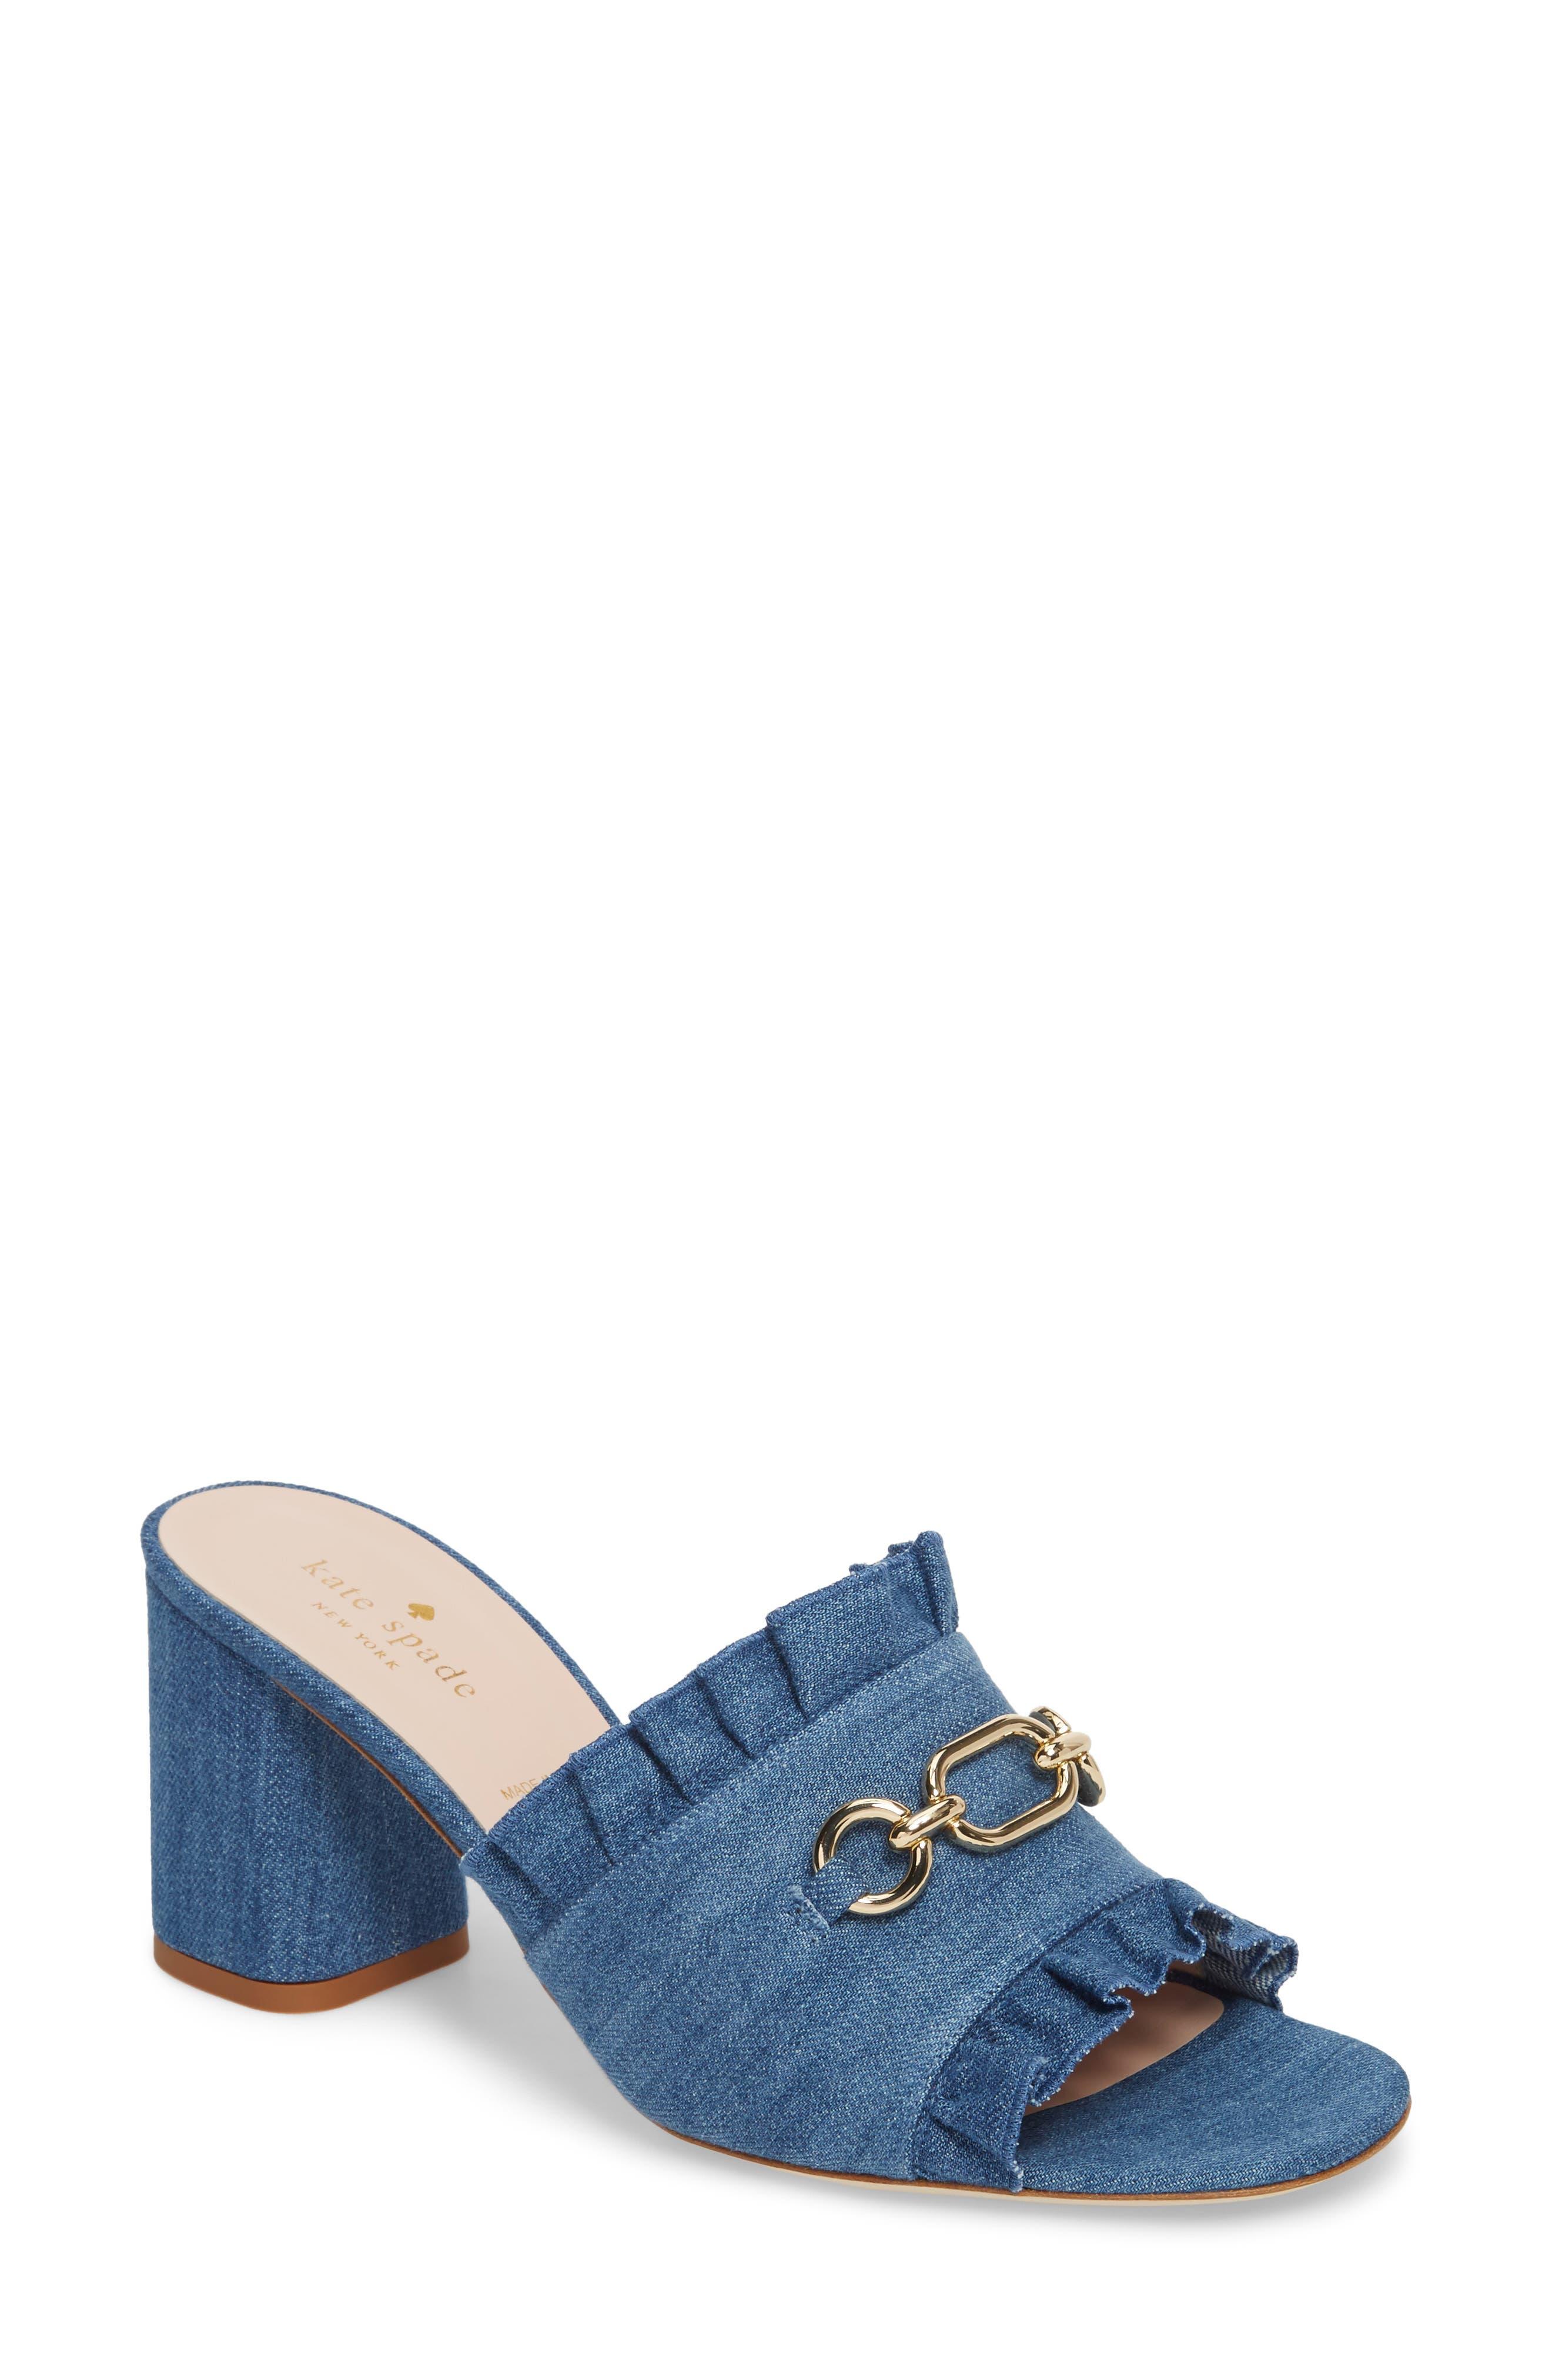 Main Image - kate spade new york demmi sandal (Women)